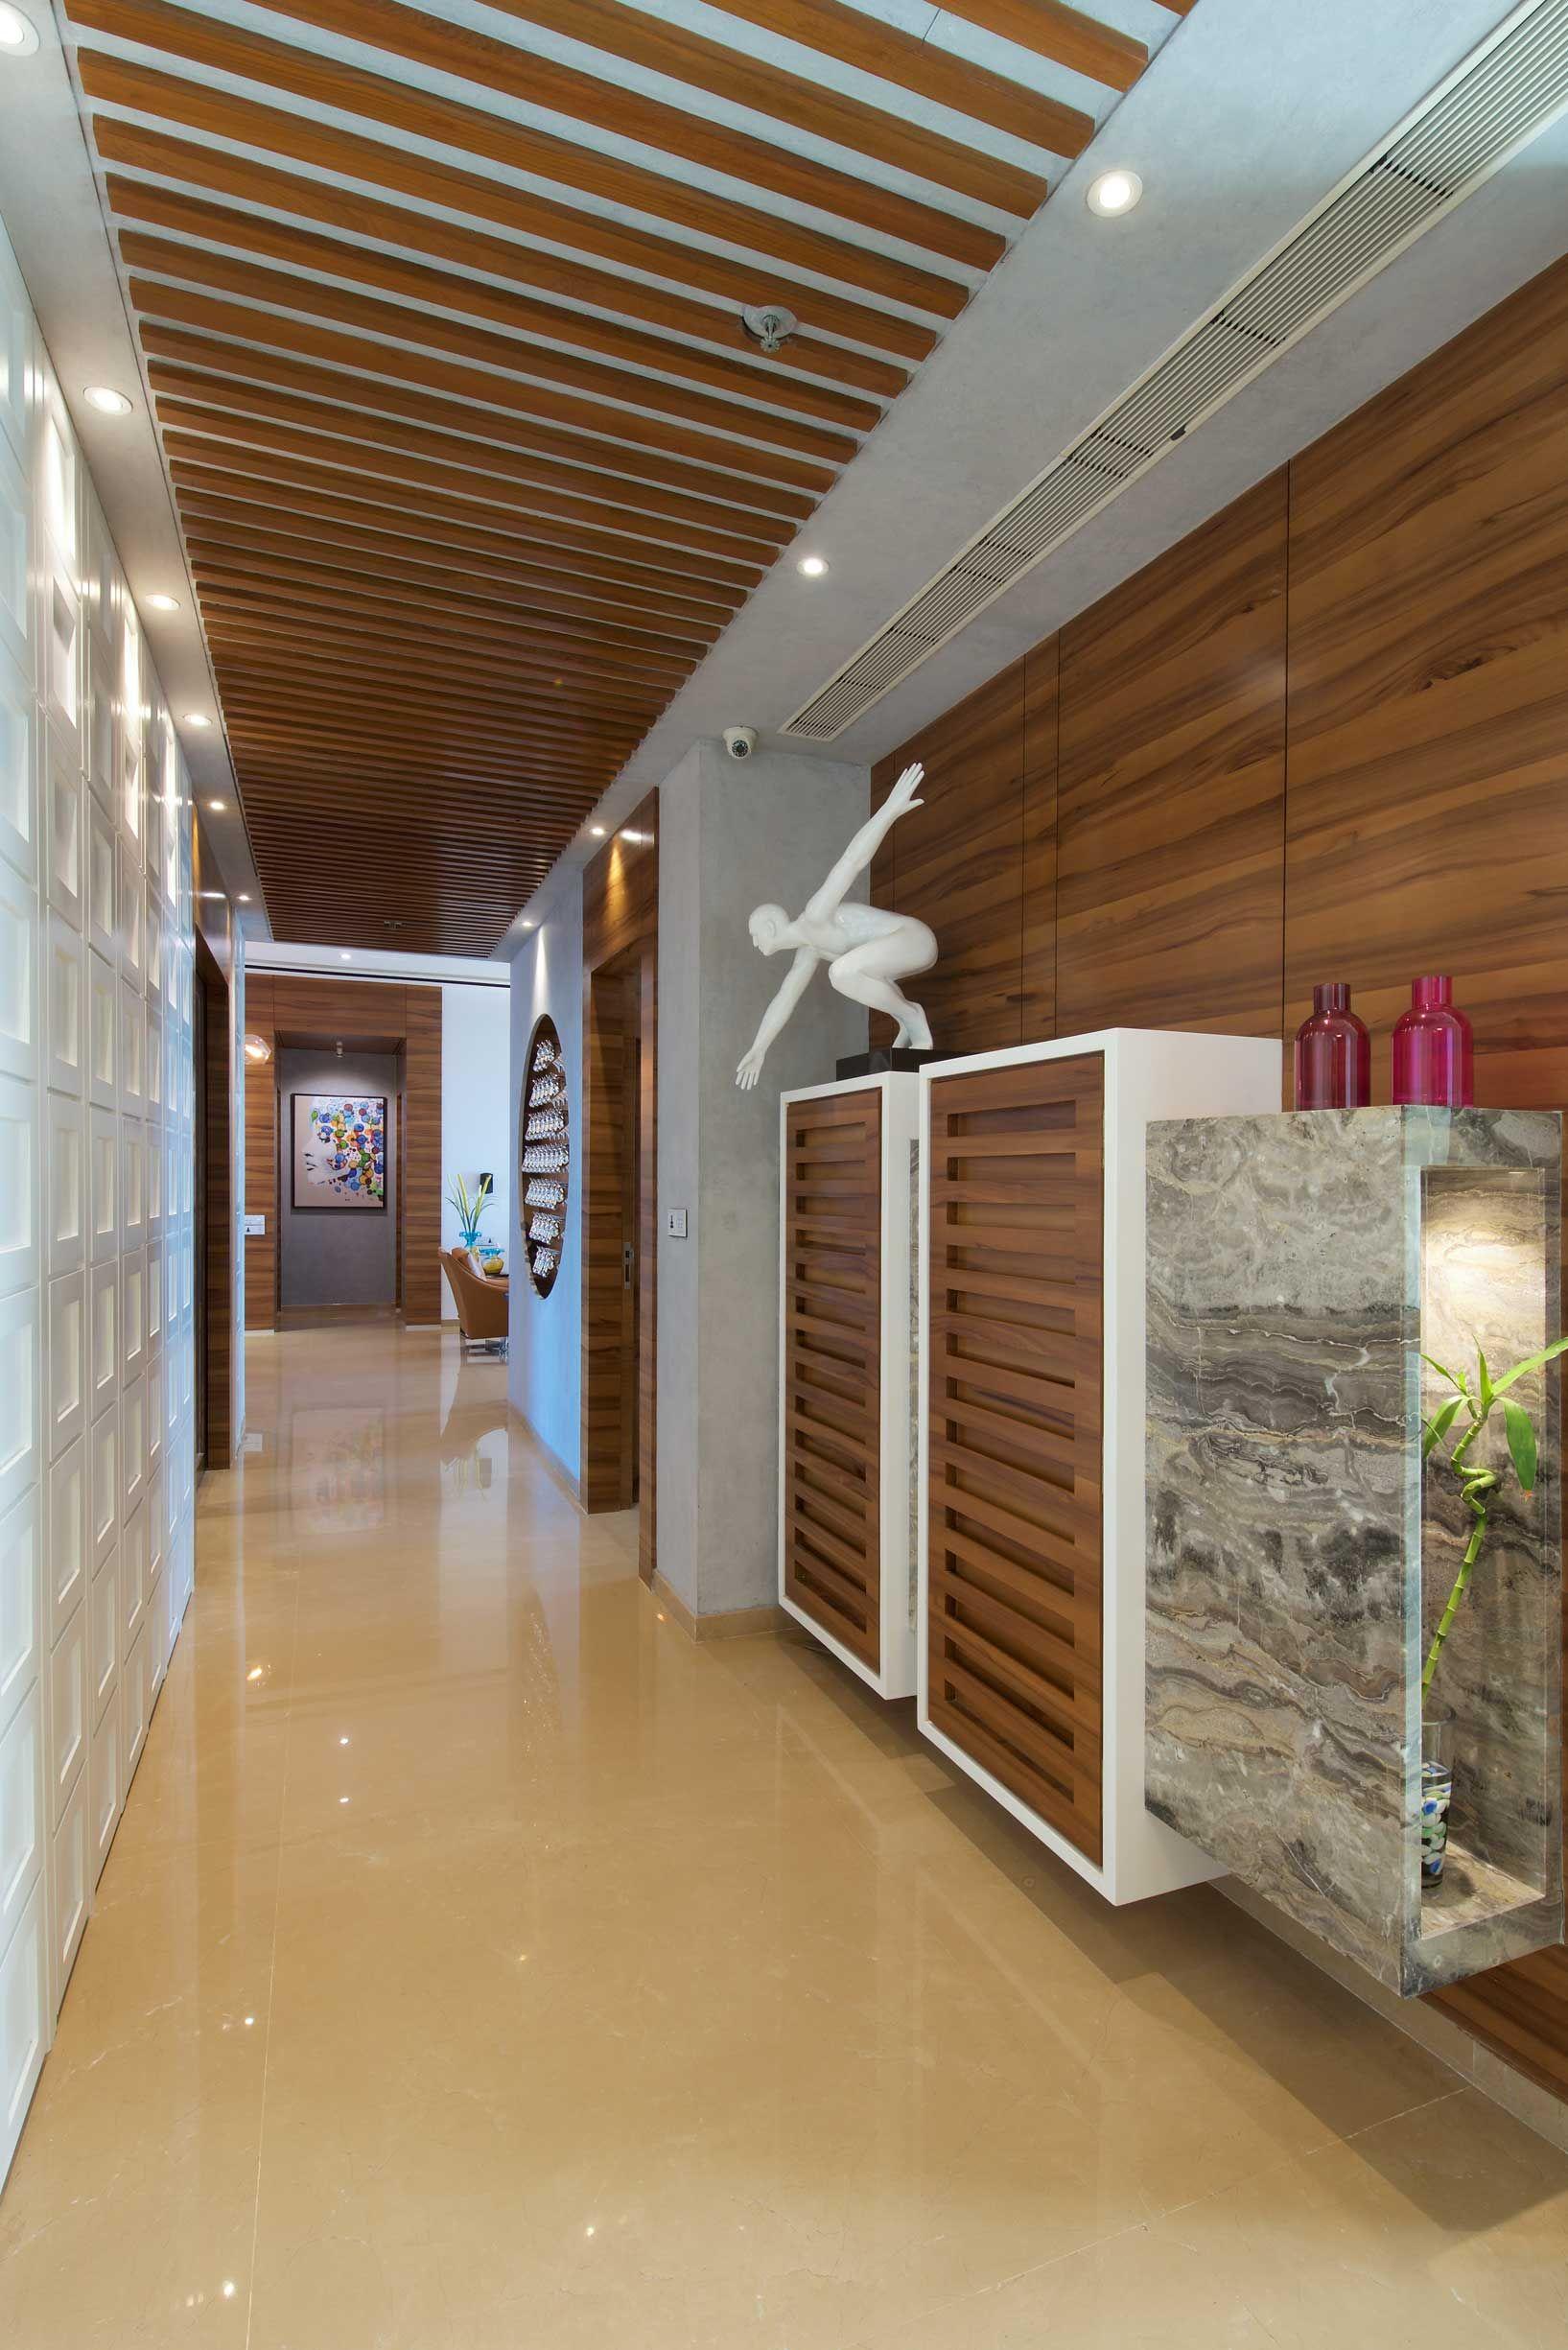 Award winning house at kk nagar chennai designed by ansari architects - Interior Design Project Mehta Residence From Gaurav Kharkar Associates